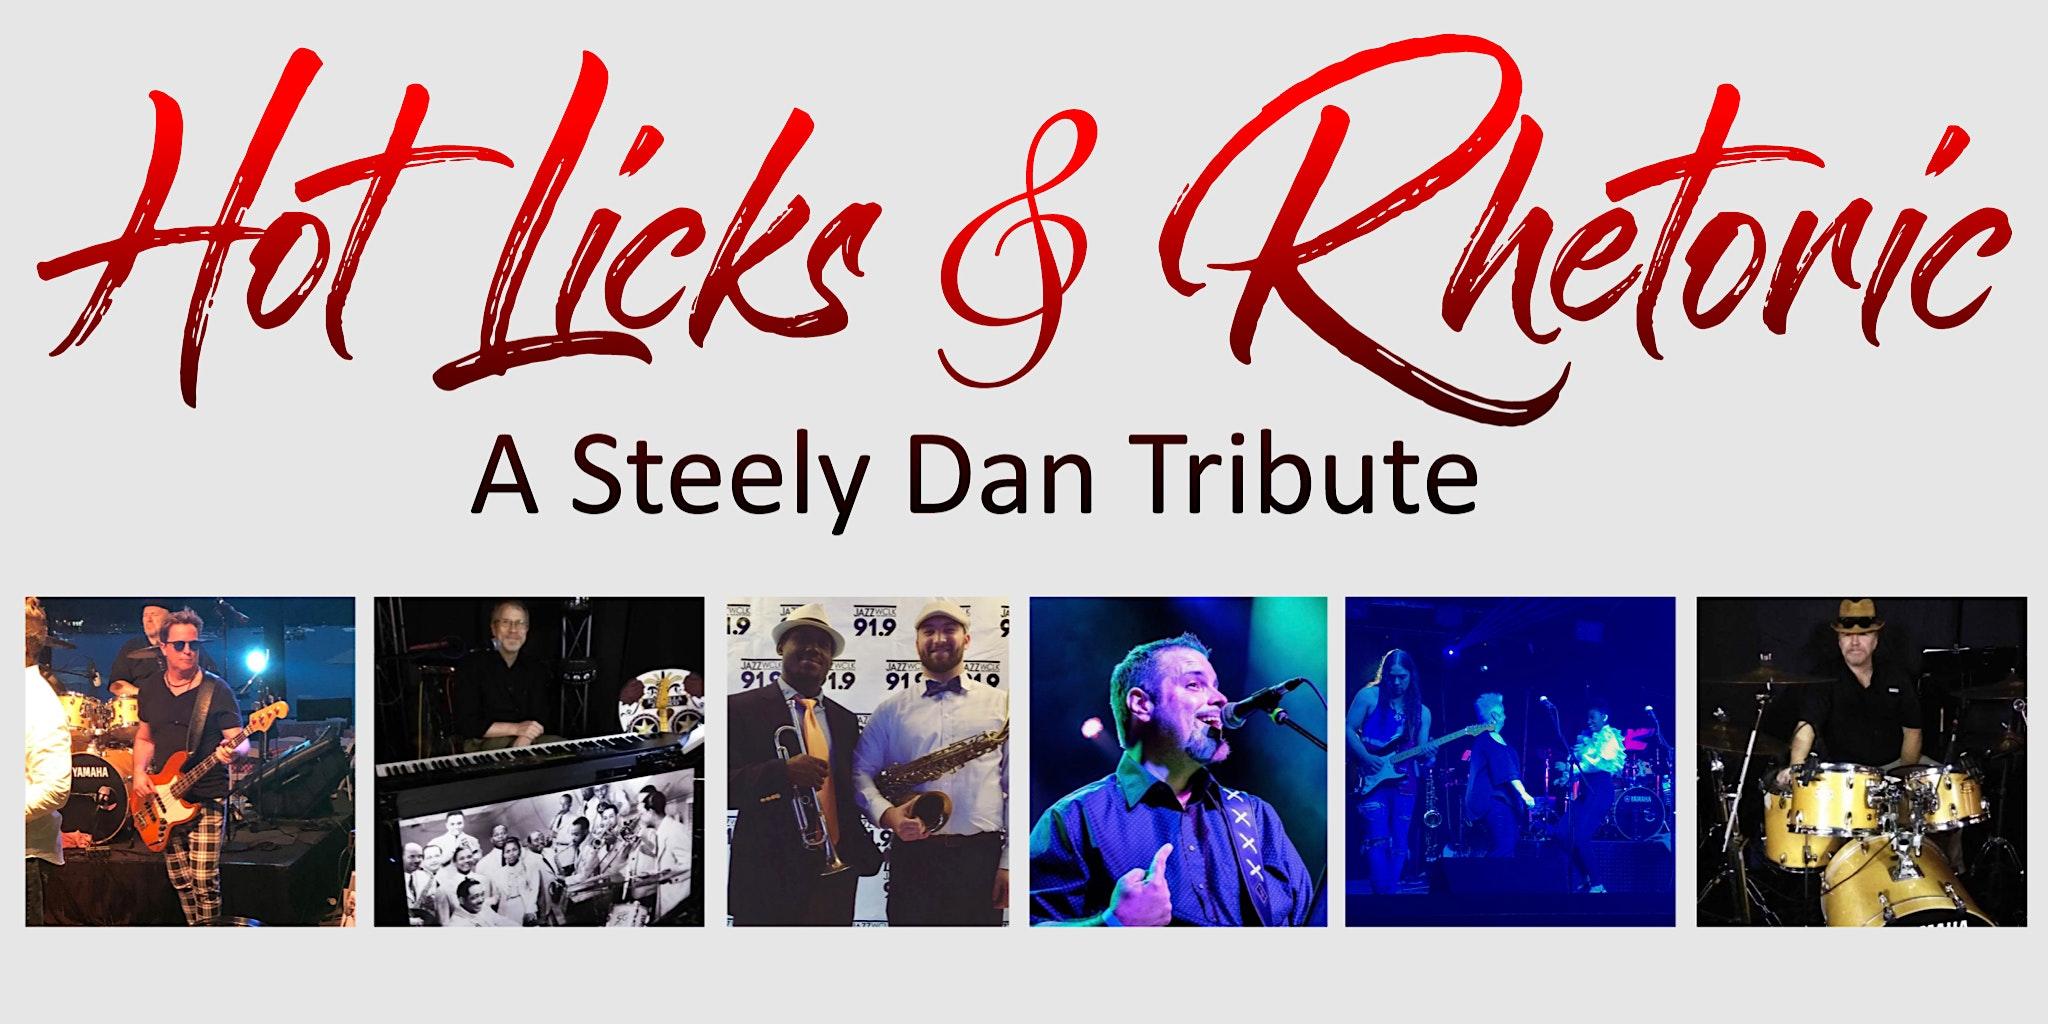 Hot Licks & Rhetoric: A Steely Dan Tribute